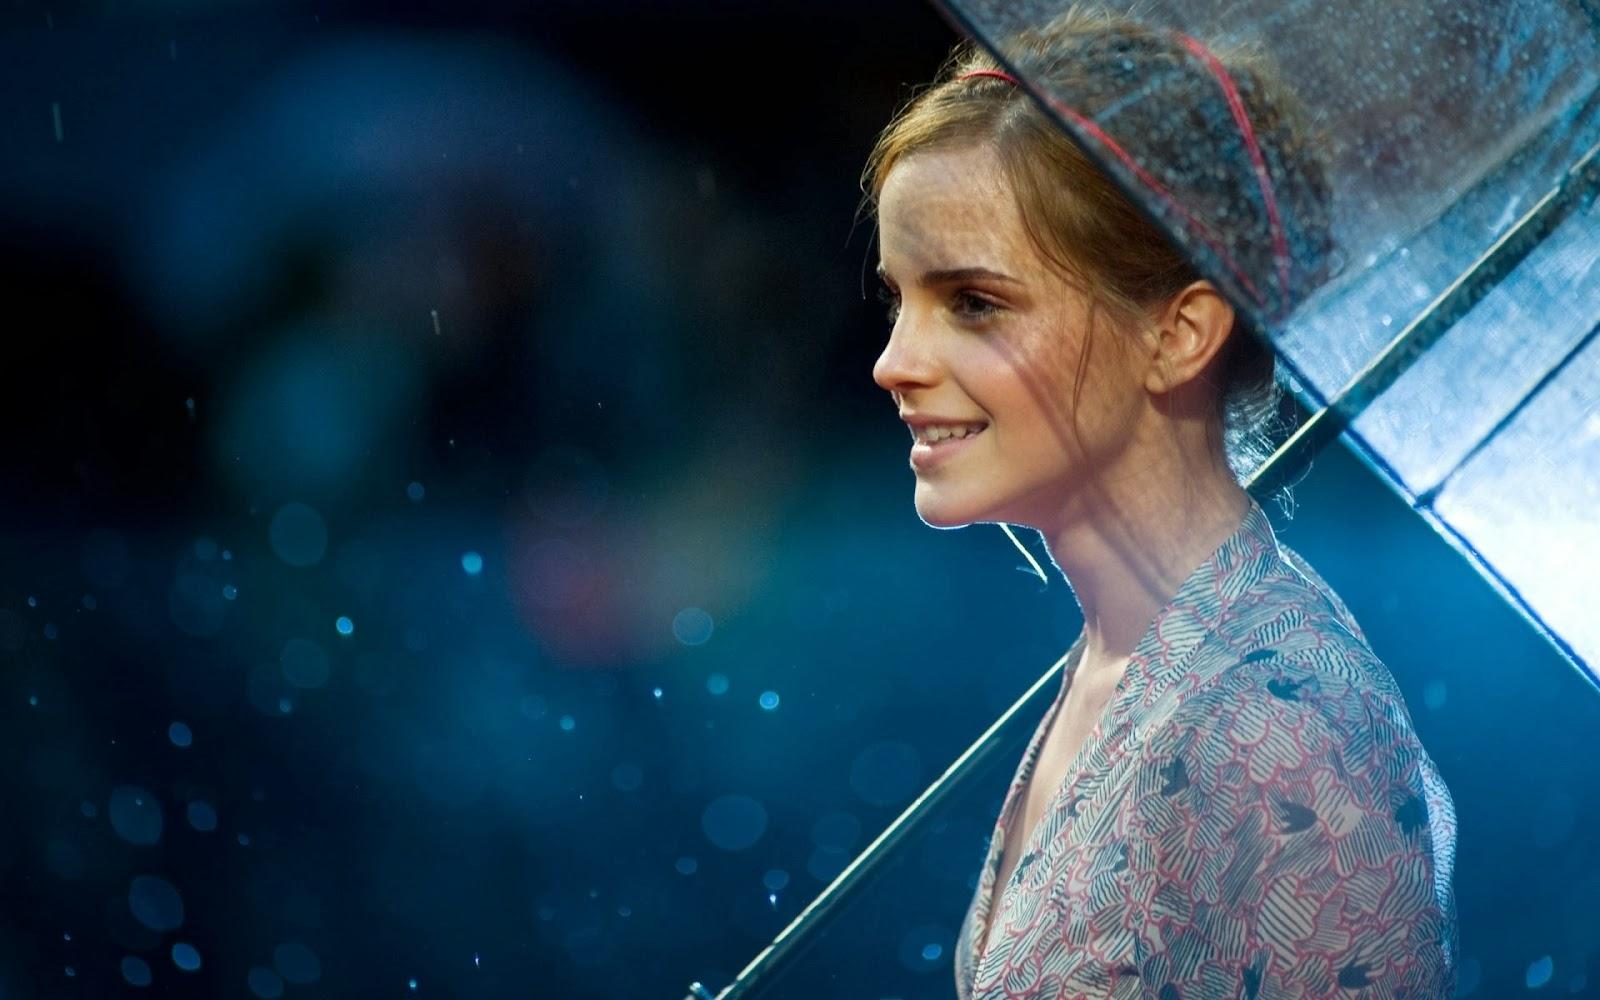 Latest Images of Emma Watson